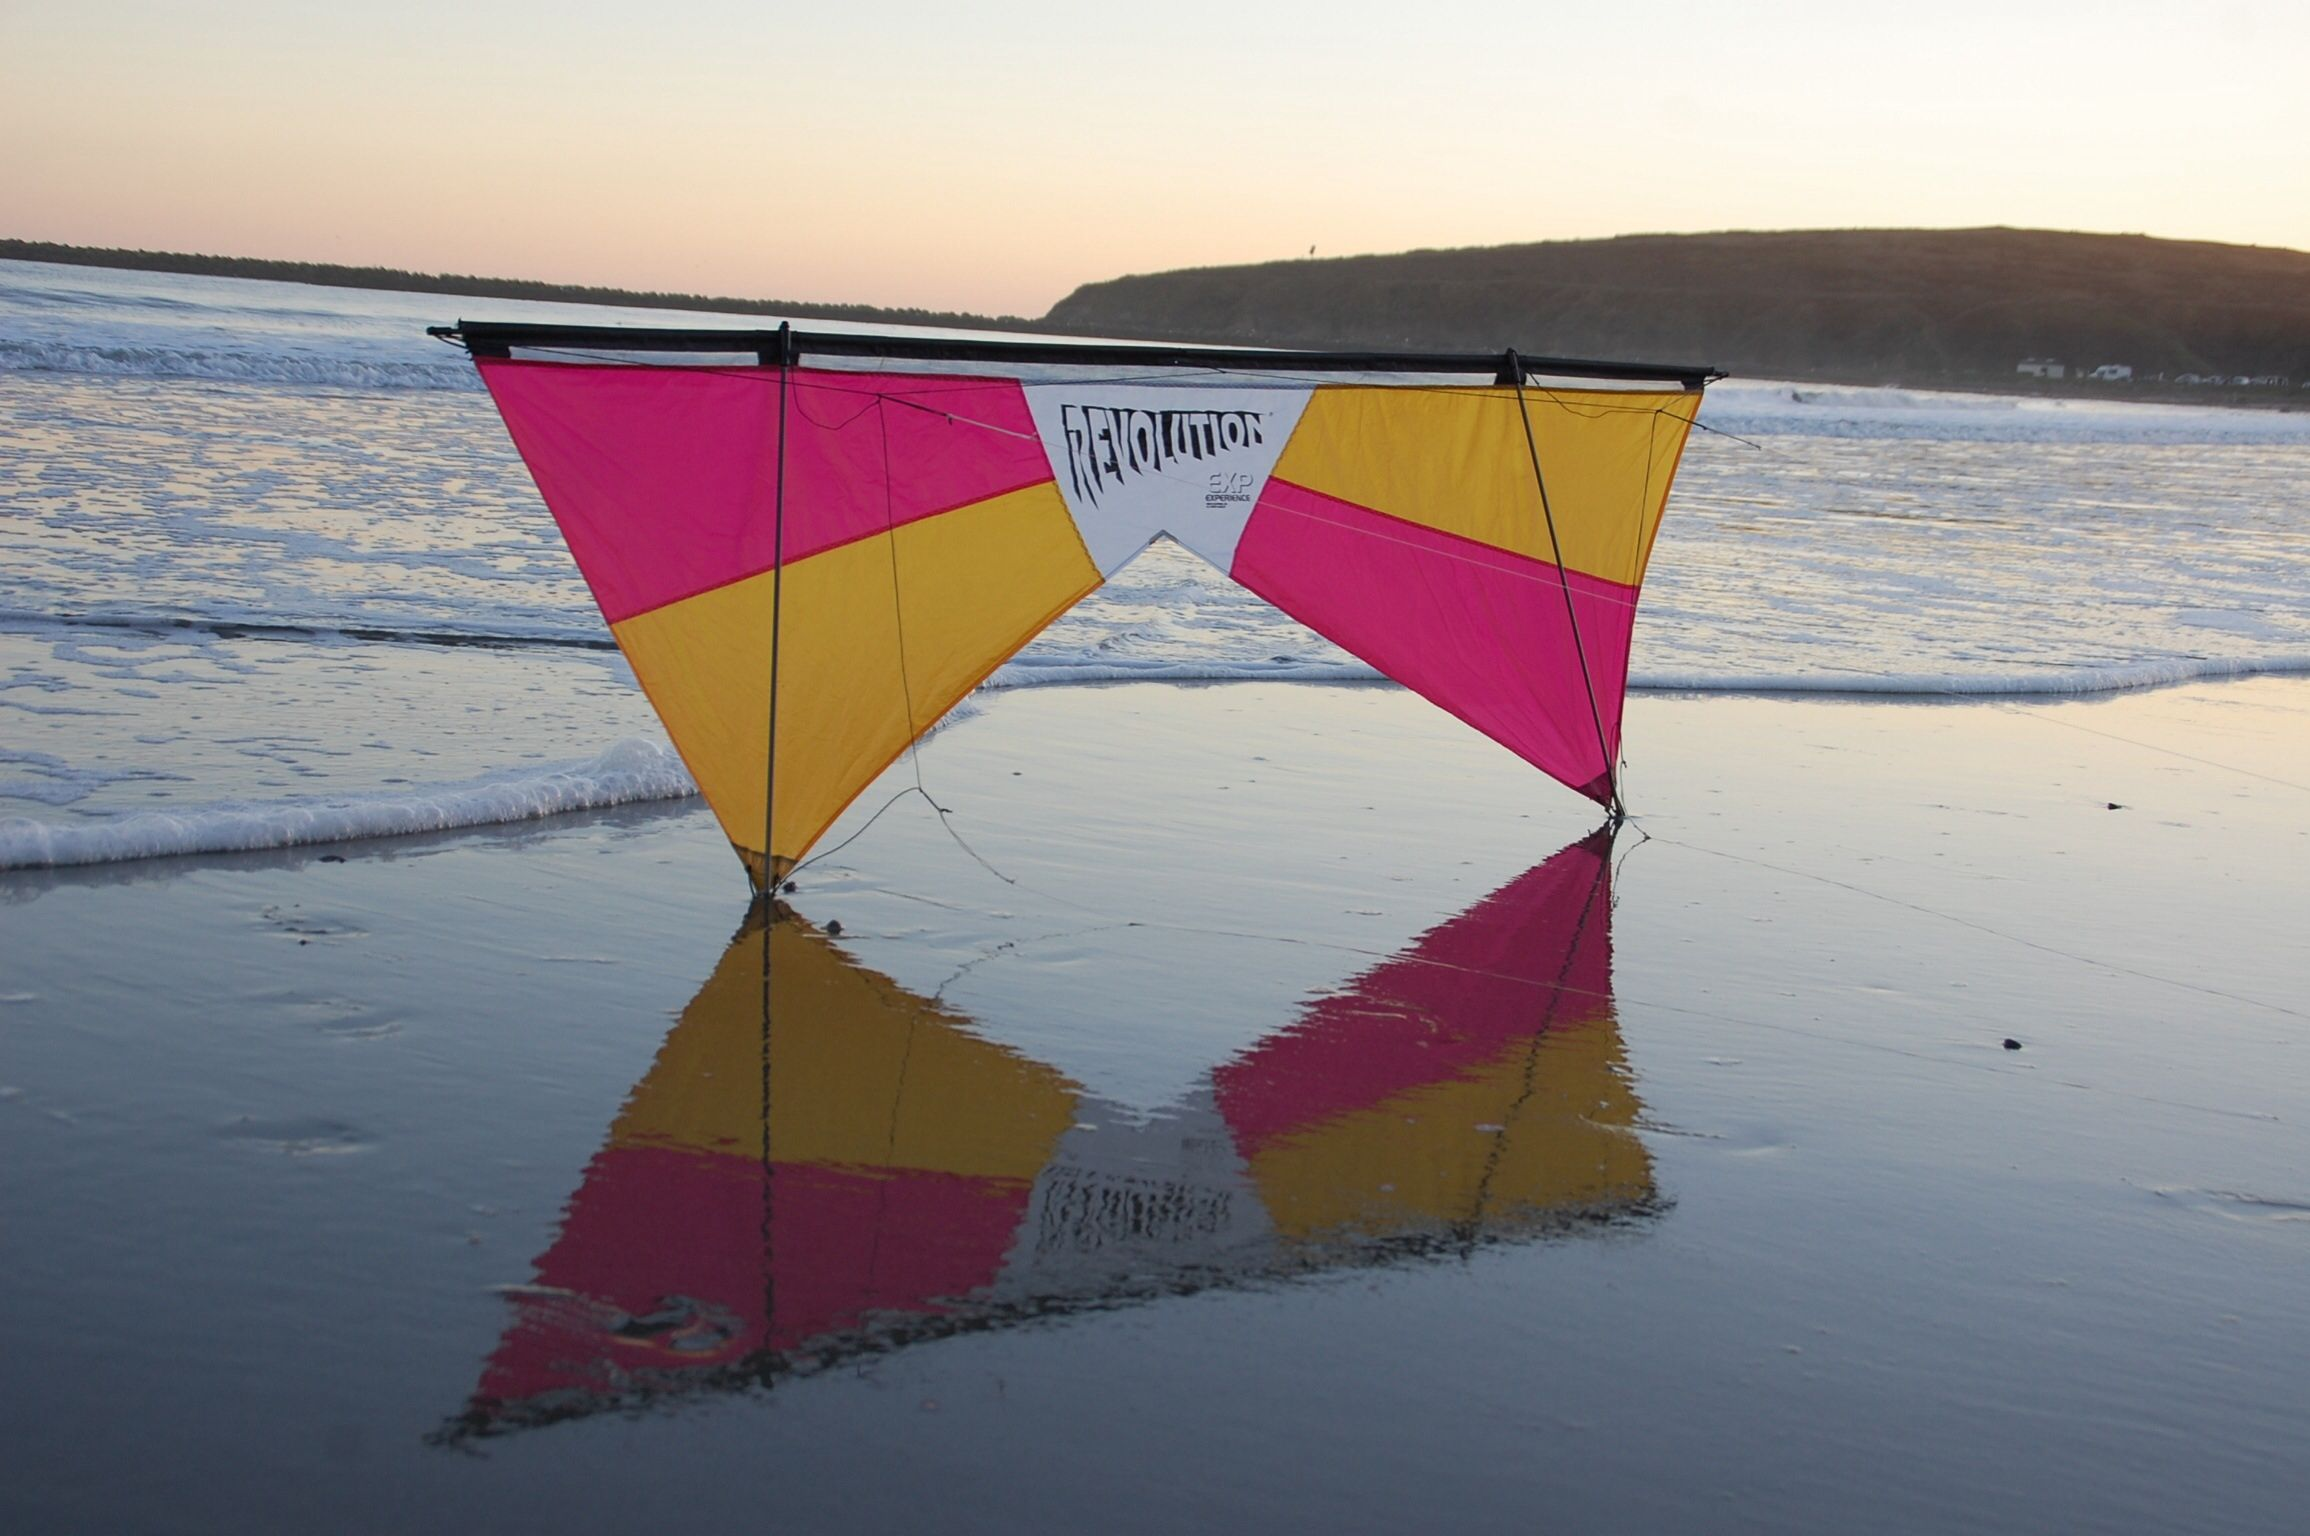 Revolution stunt kites Power kite, Stunt kite, Kite